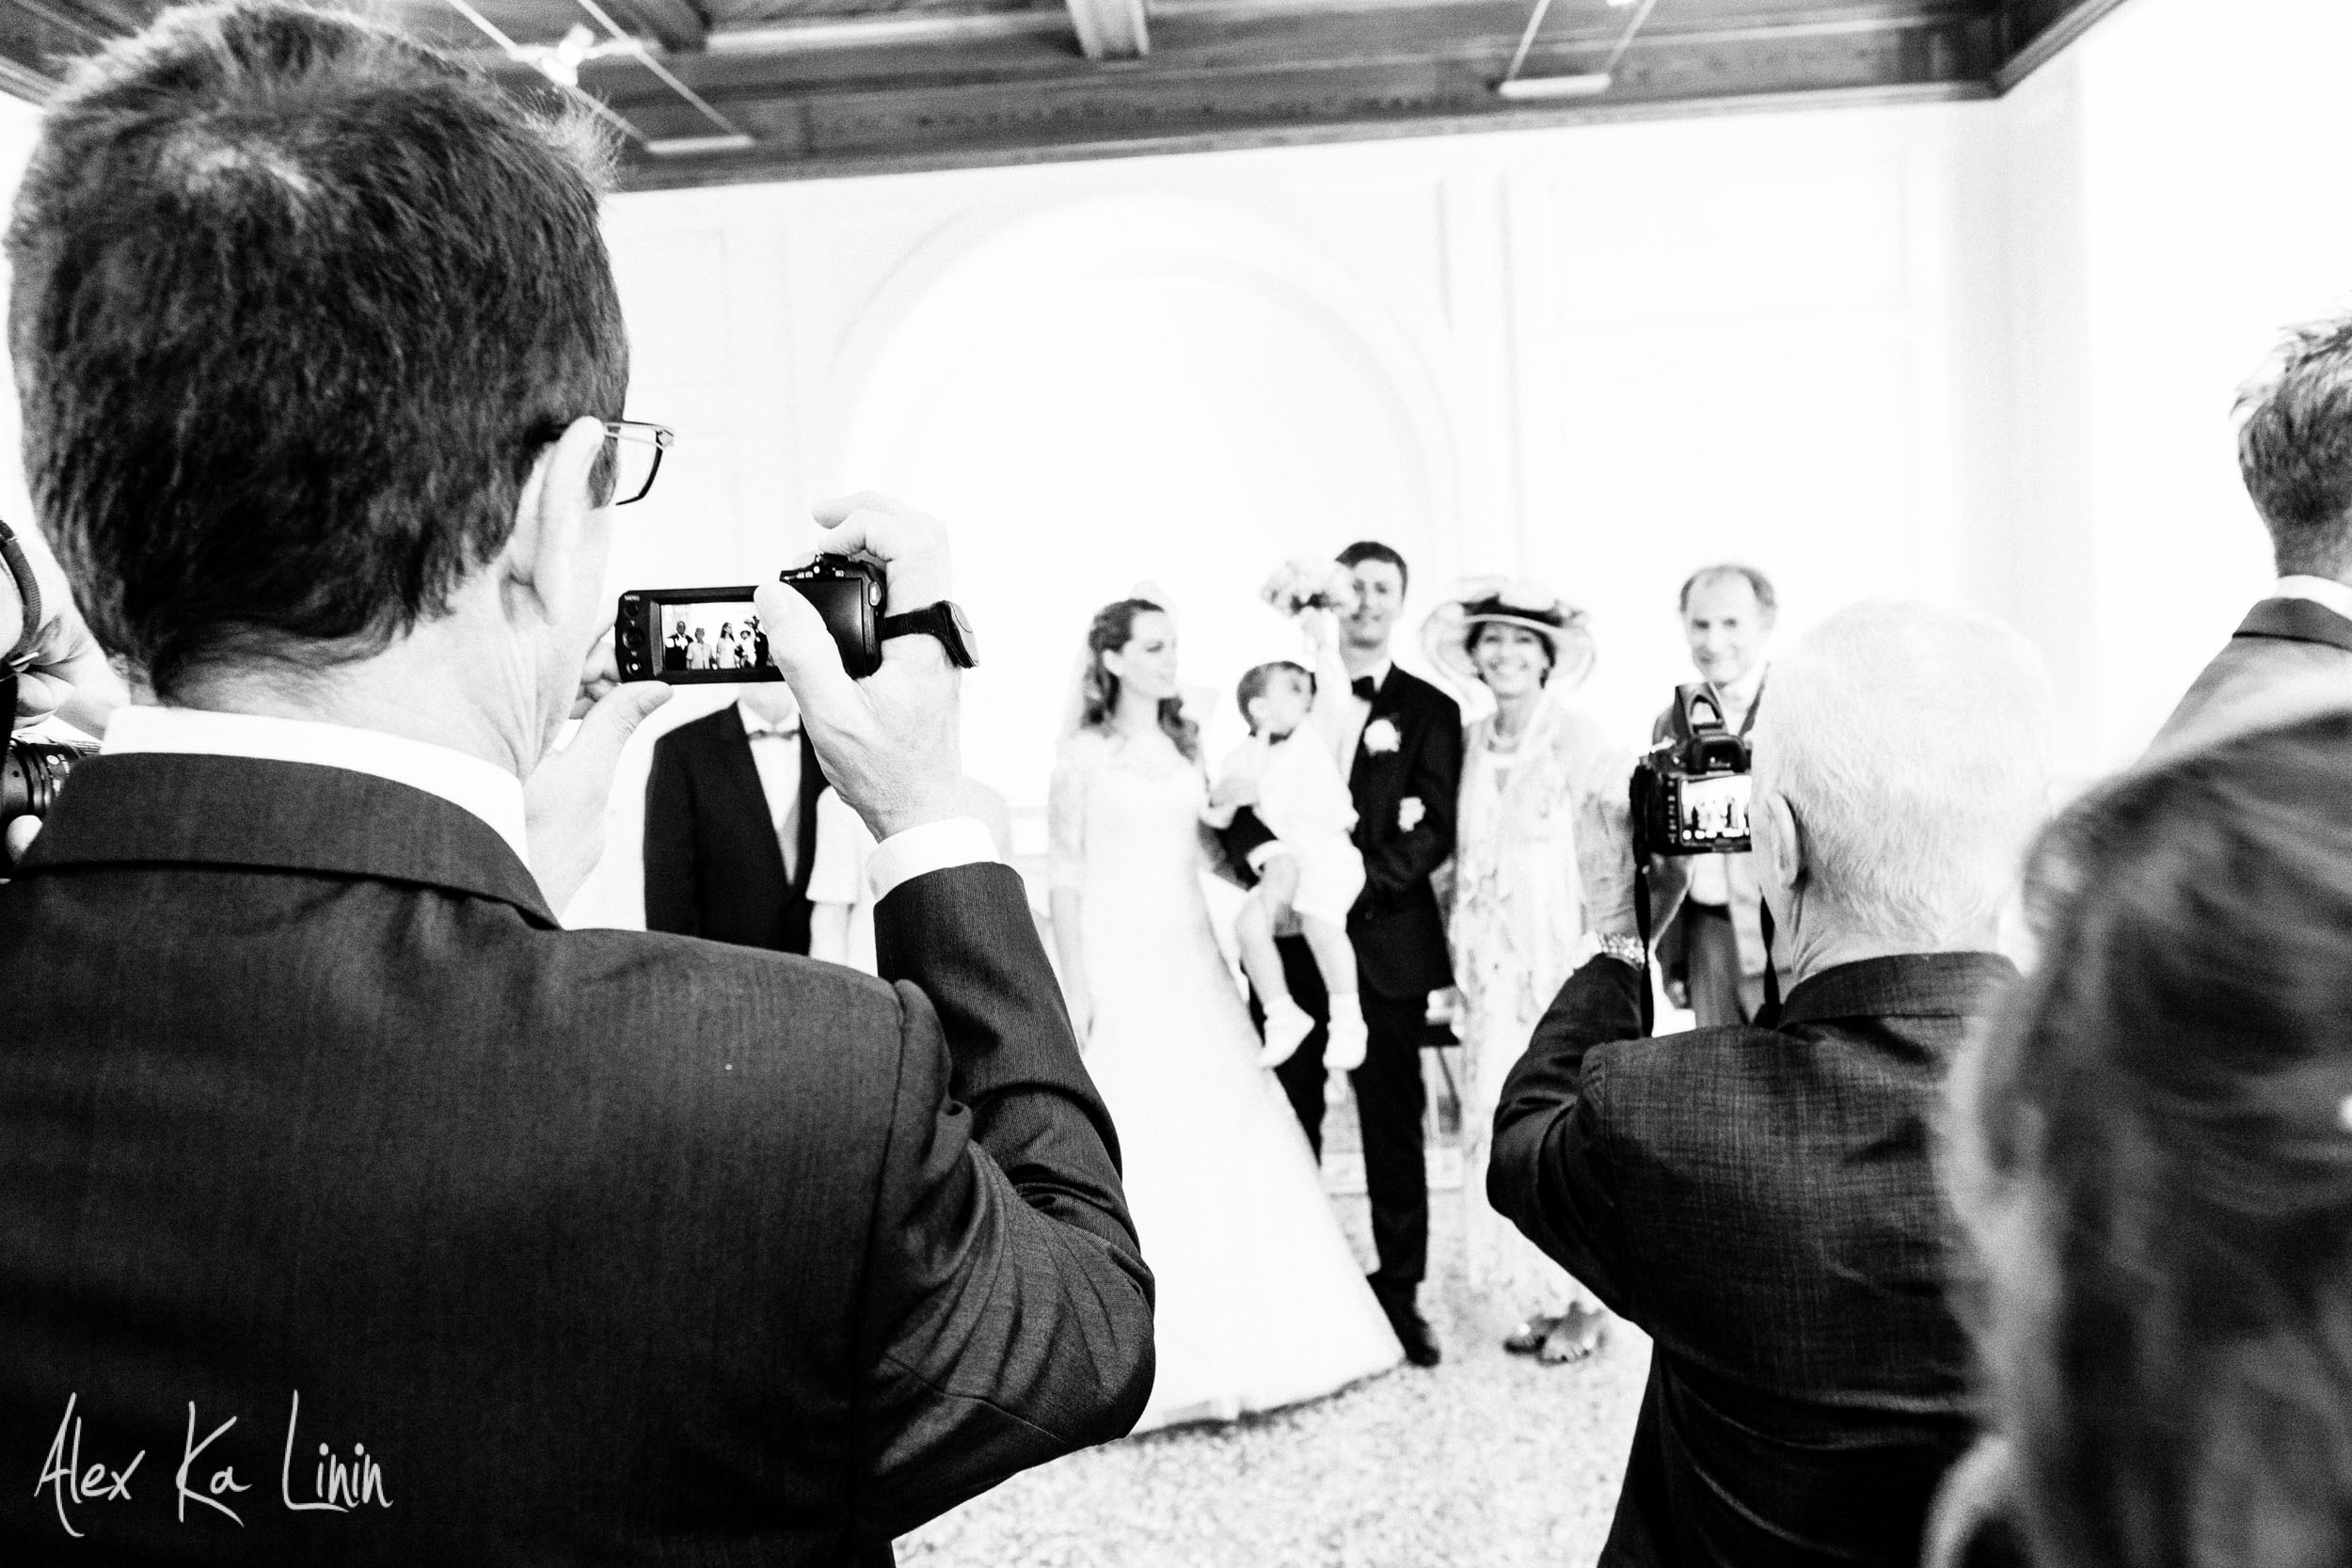 AlexKa_wedding_mariage_photographer-15.jpg